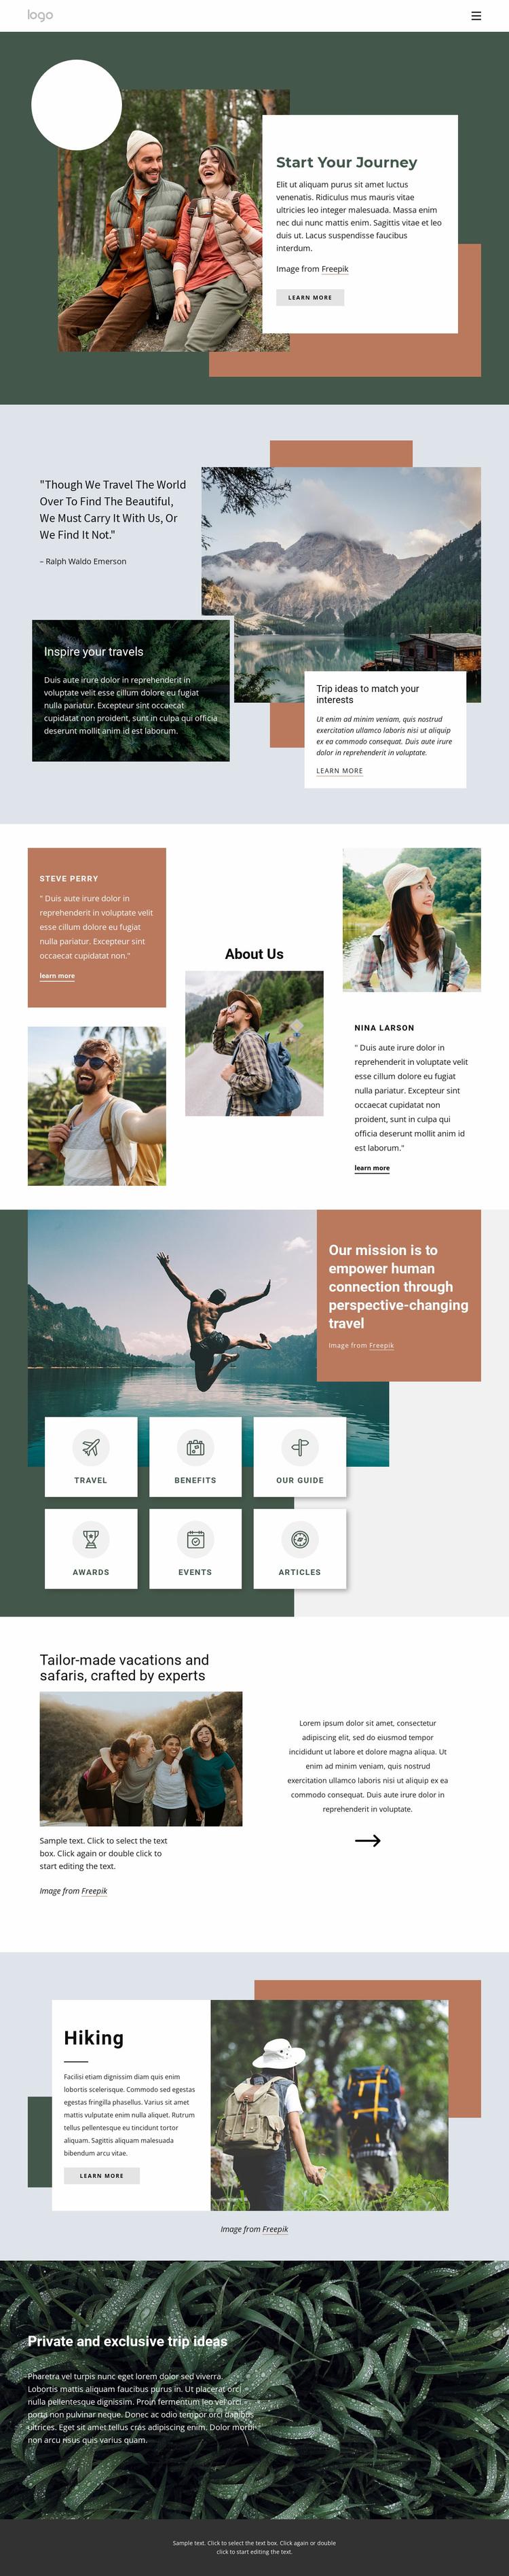 Adventure travel company Website Design